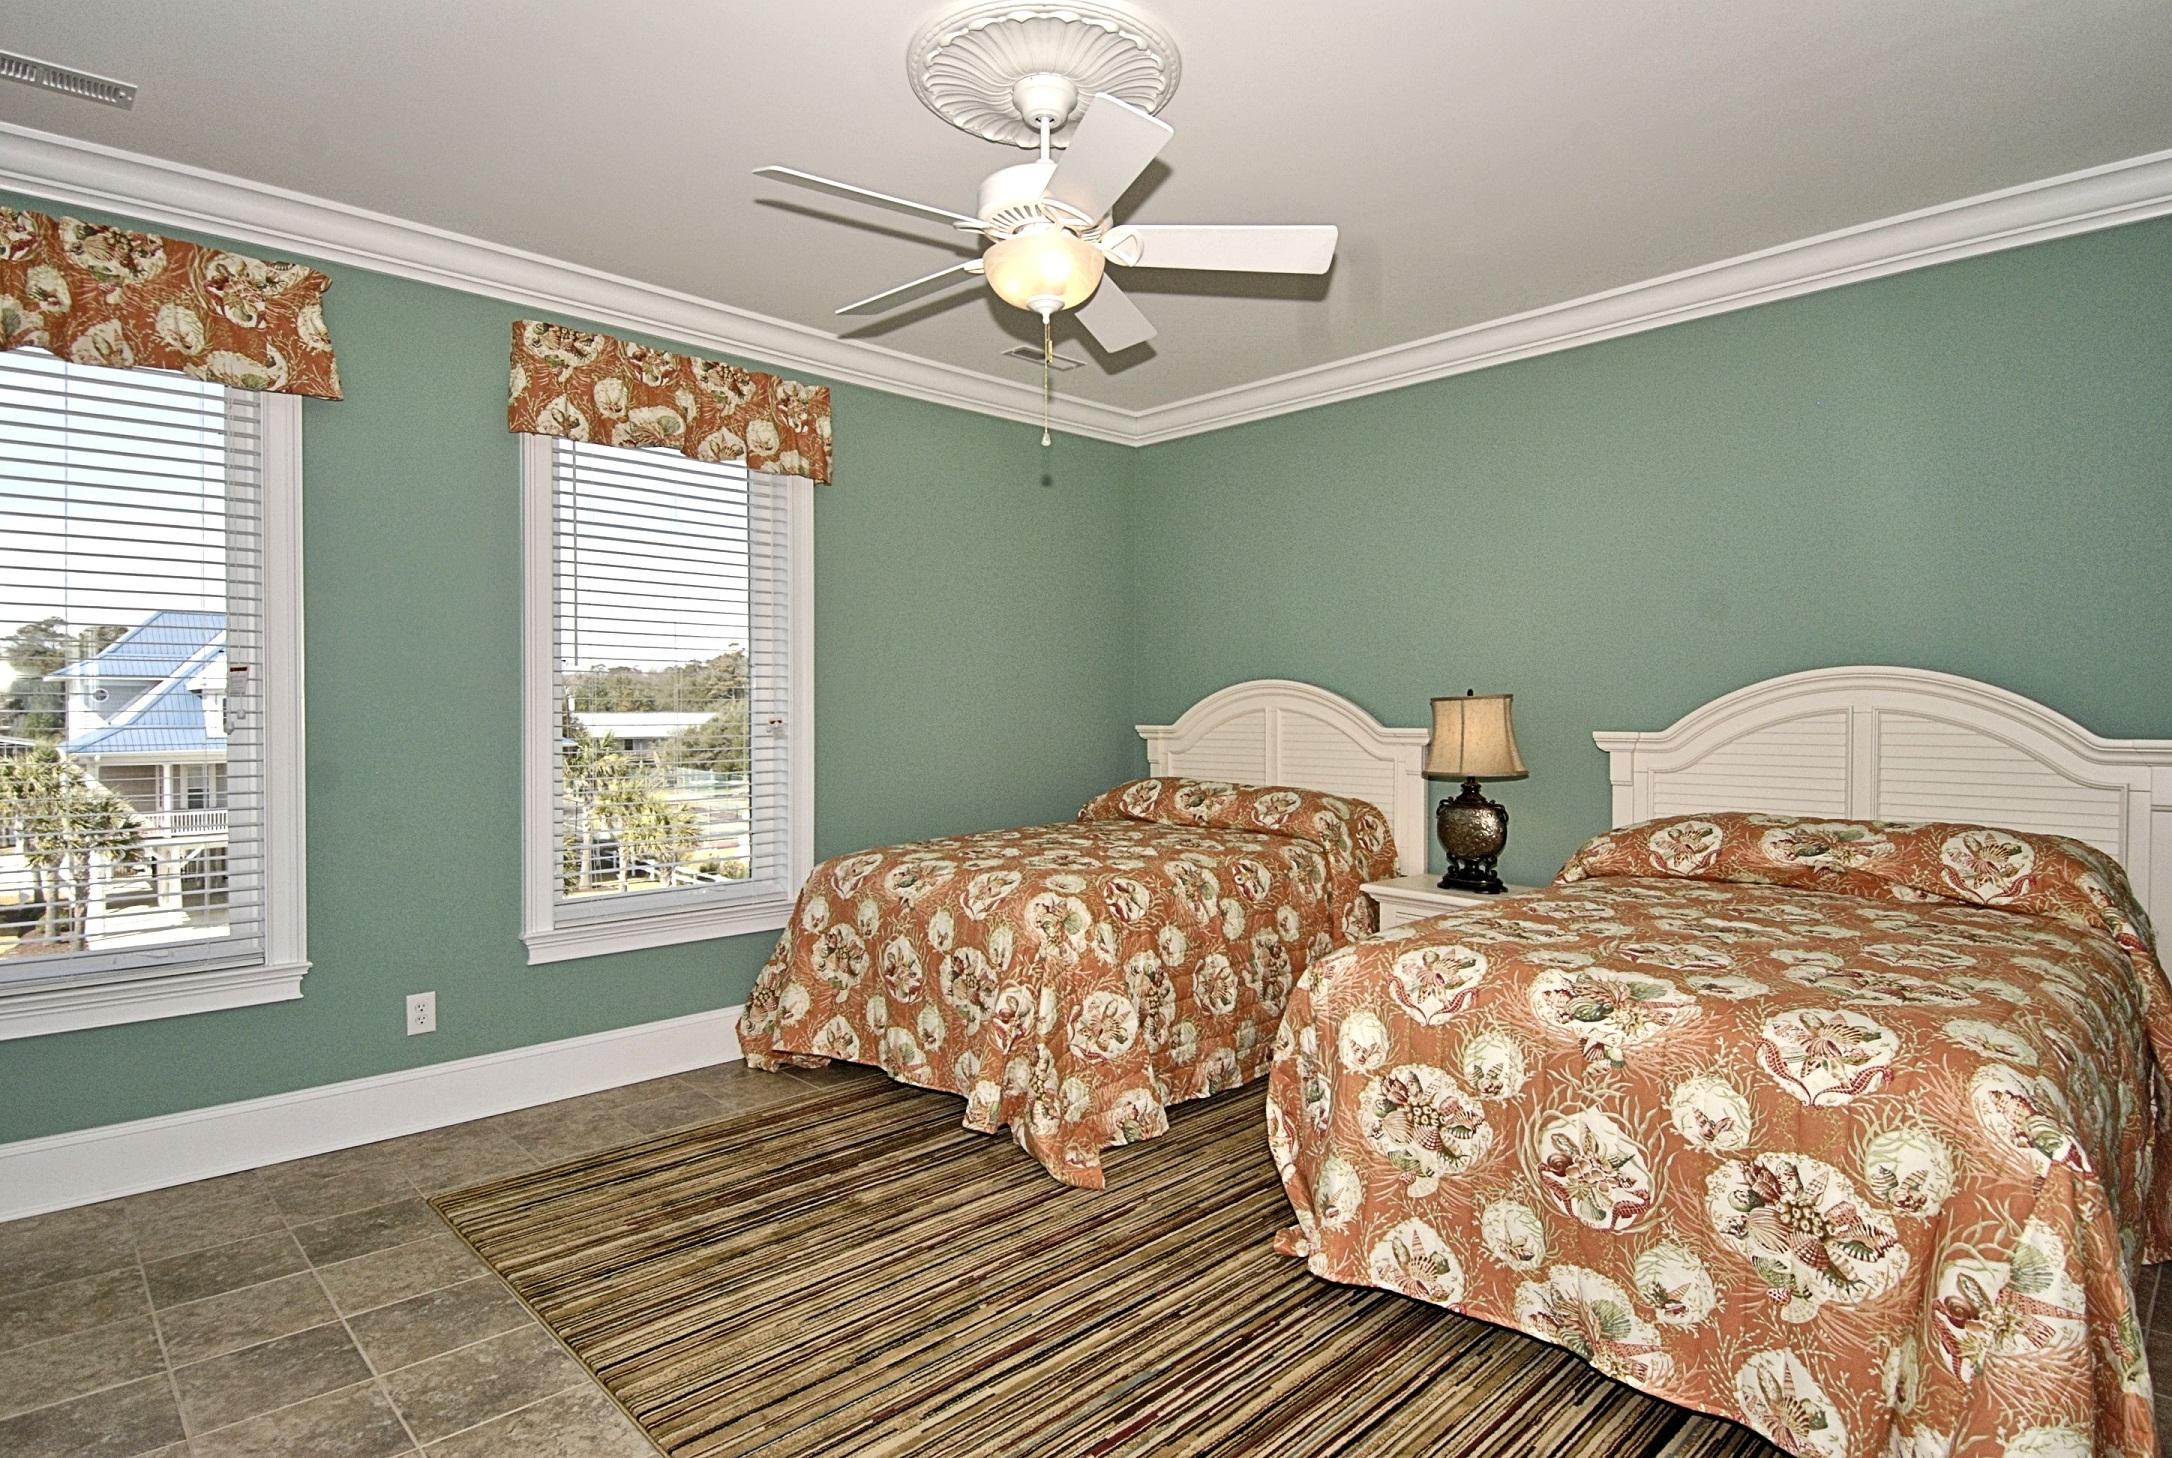 Hakuna Matata 4807 S Ocean Blvd Long Bay Estates Mb Sc 29575 Beach Realty